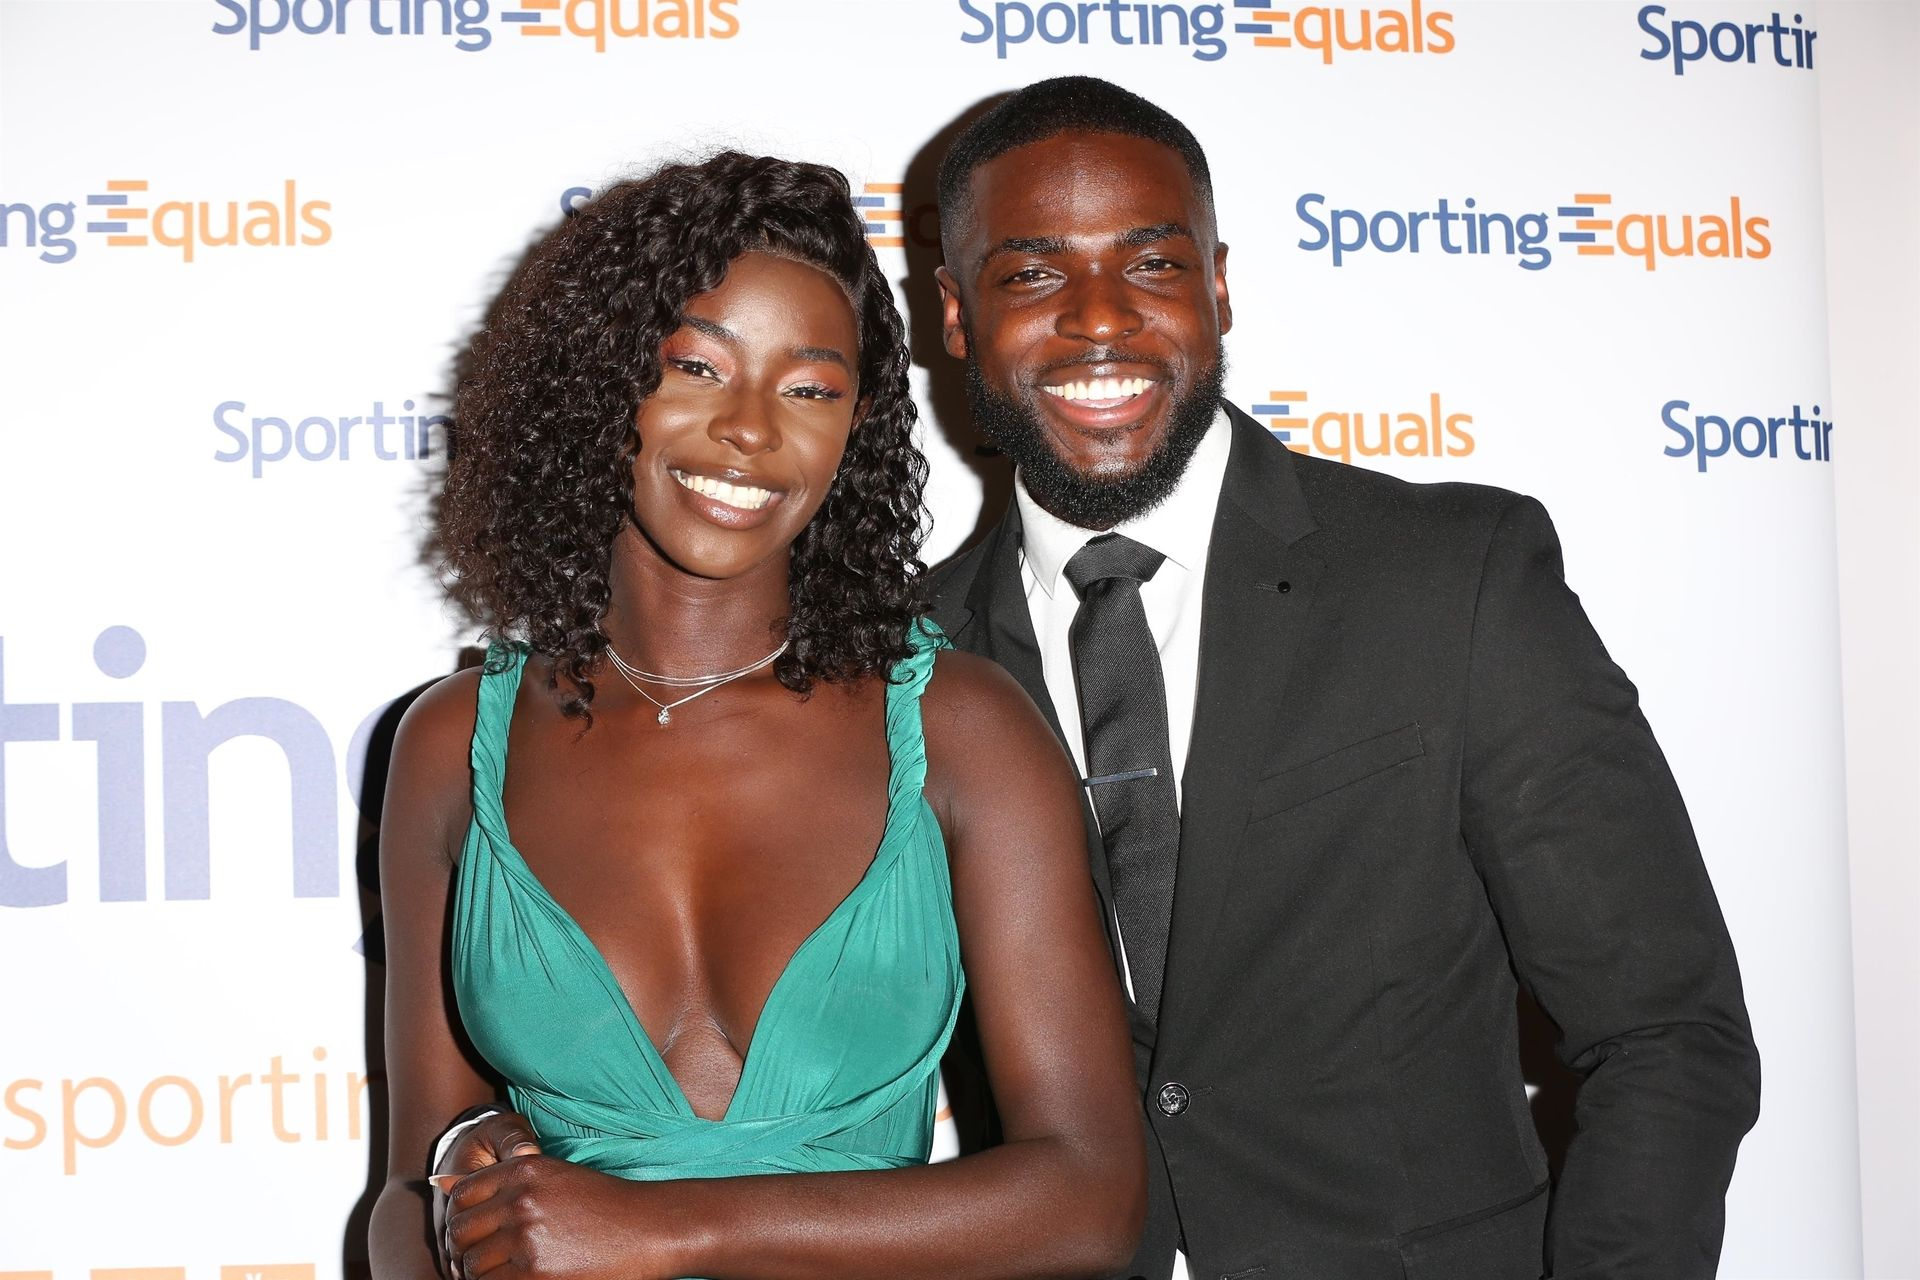 Mike Boateng & Priscilla Anyabu Are Seen At British Ethnic Diversity Sports Awards 0114